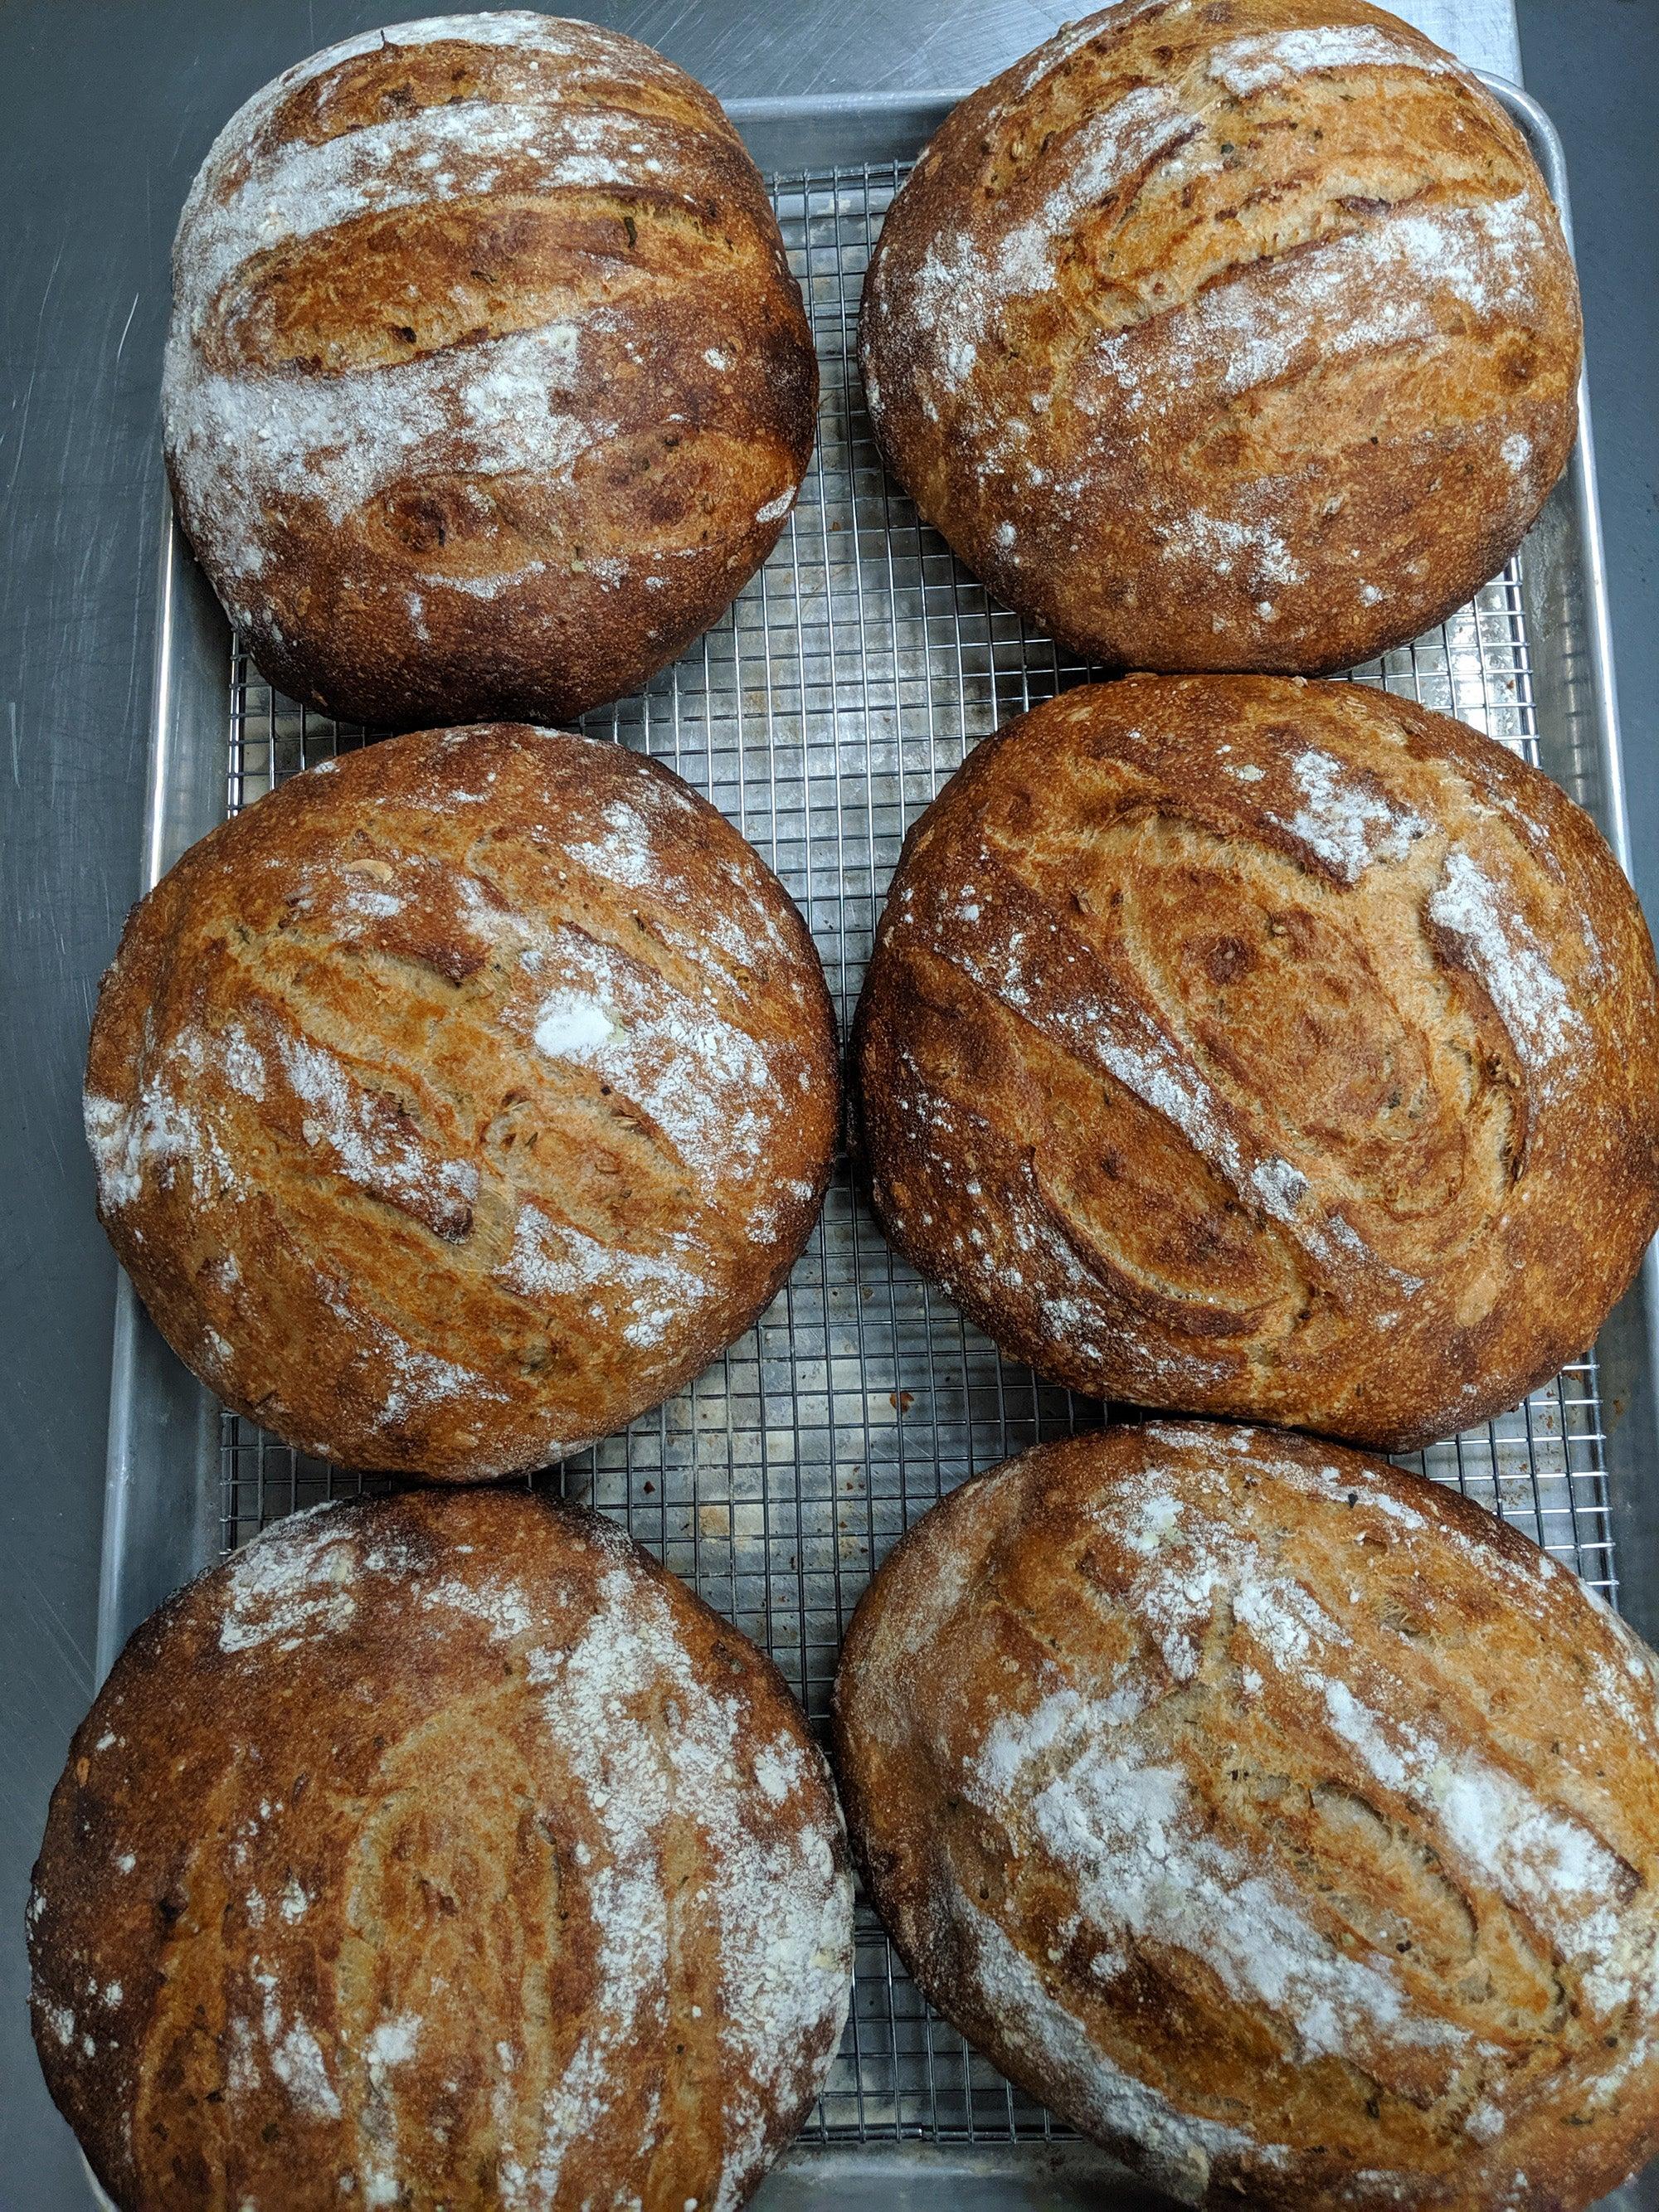 Sourdough loaves at Brato Brewhouse + Kitchen